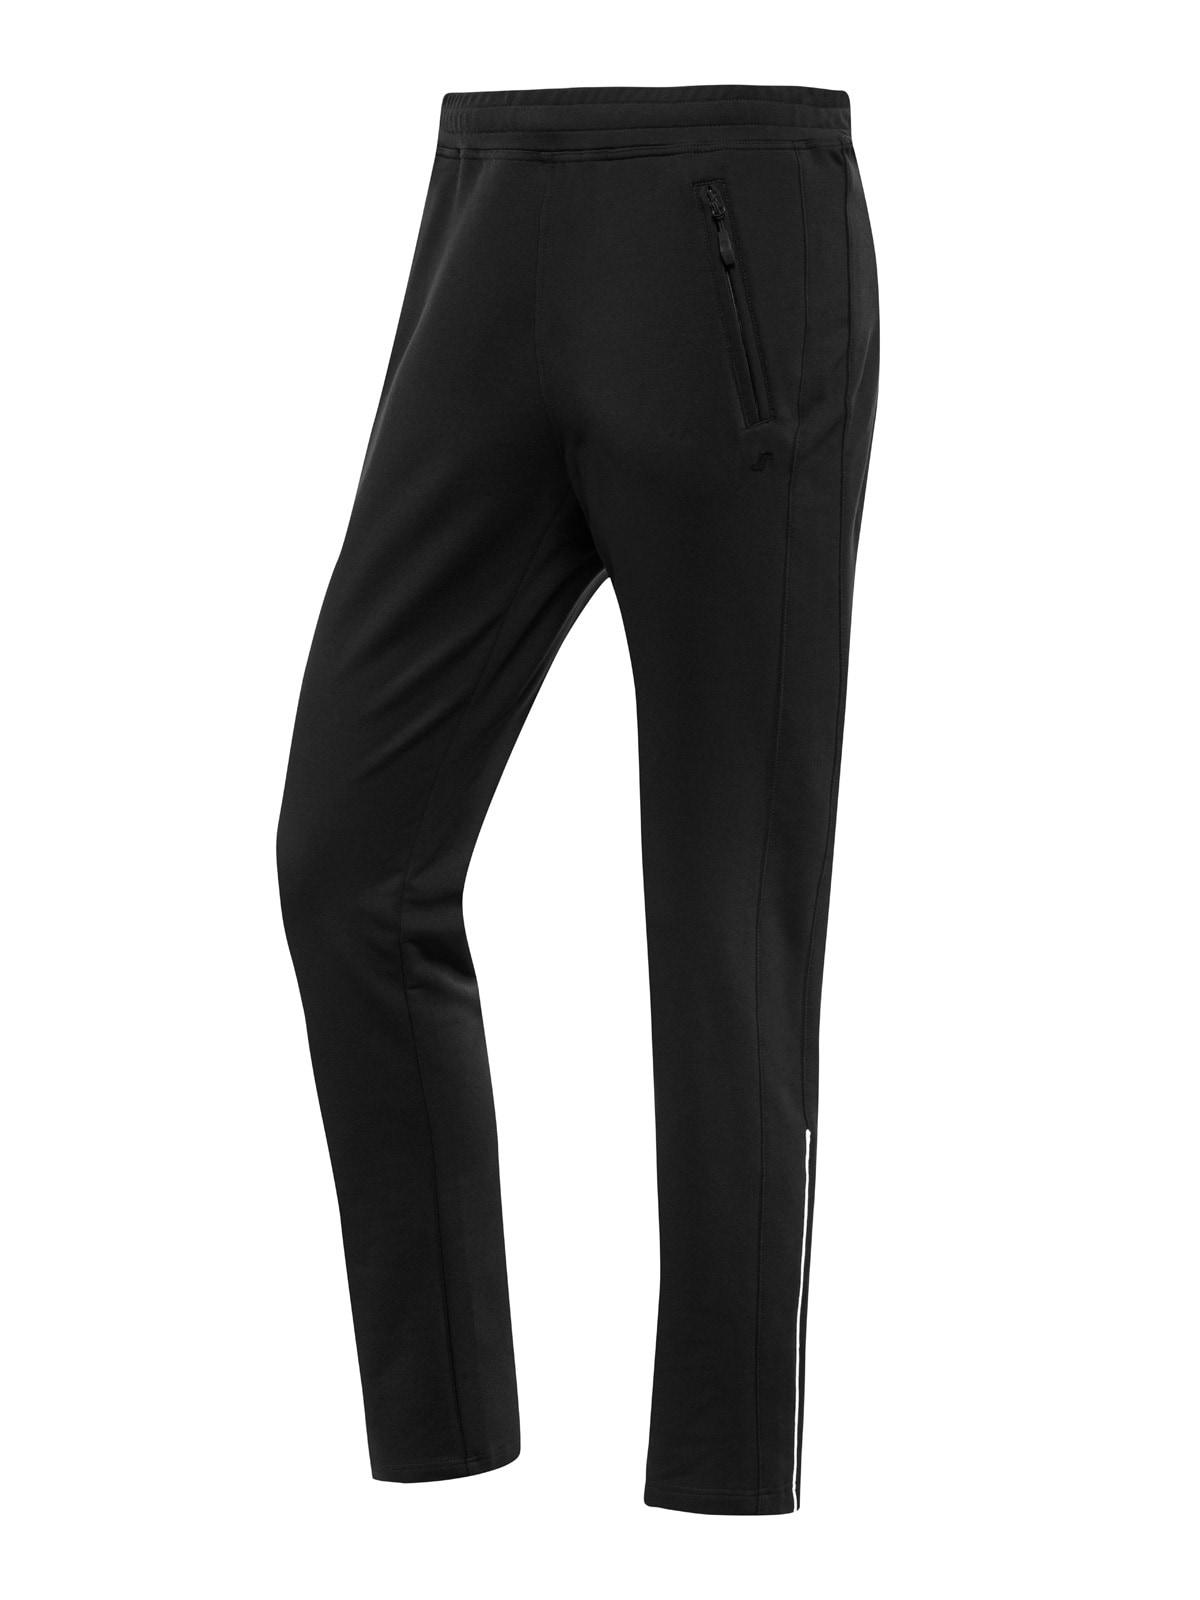 Joy Sportswear Trainingshose MATHIS | Sportbekleidung > Sporthosen | Joy Sportswear